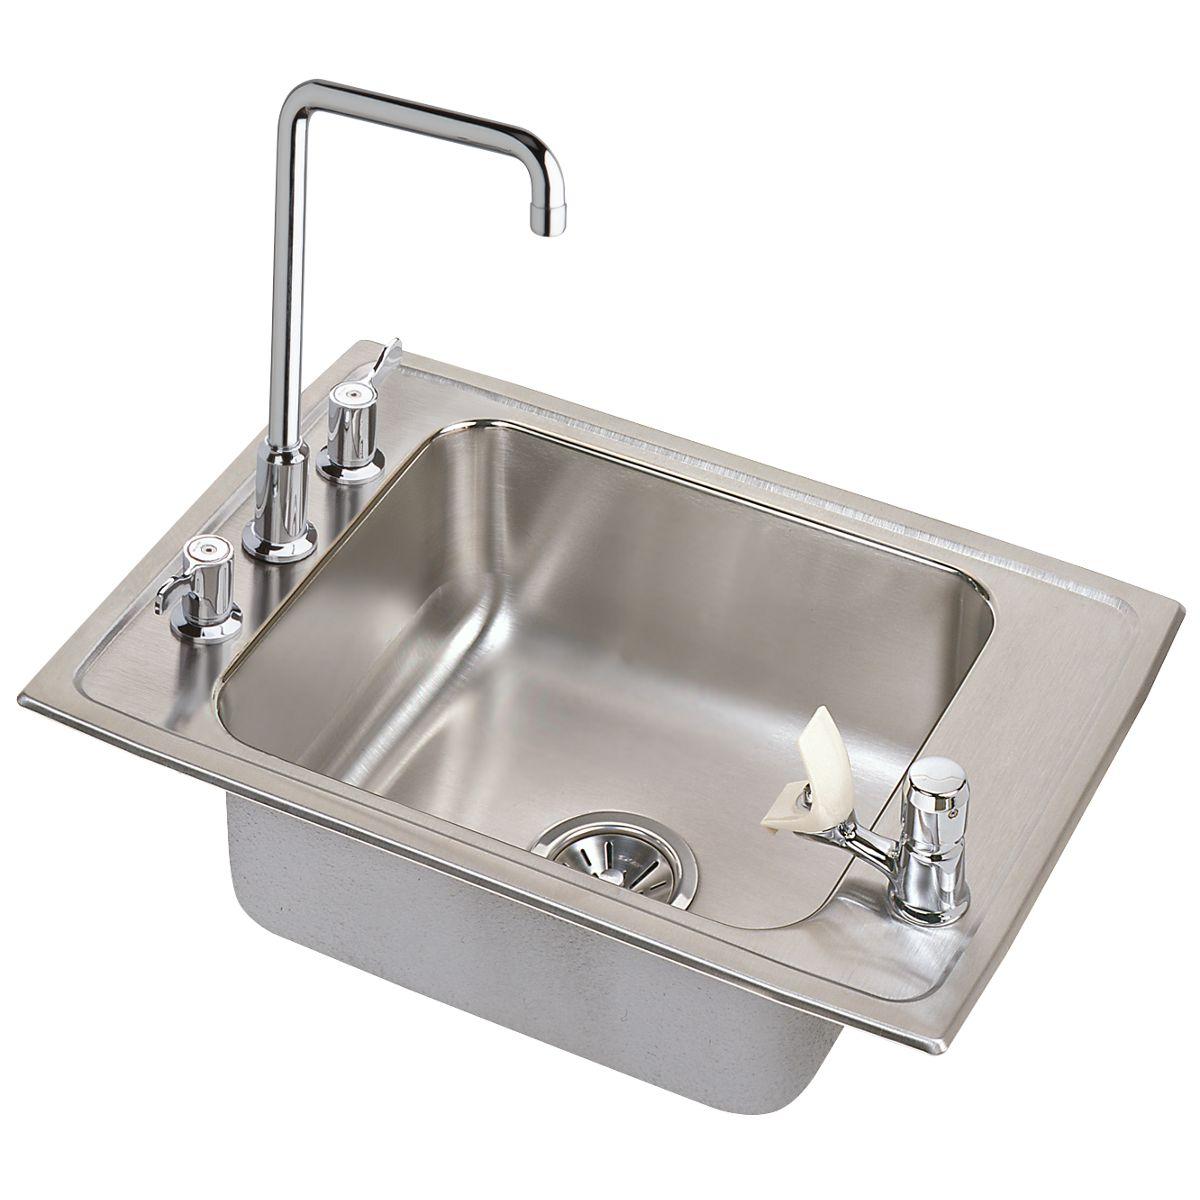 Elkay® DRKRC2517C Classroom Sink and Faucet/Bubbler Kit, Rectangular, 17 in W x 7-5/8 in H, Top Mount, 304 Stainless Steel, Lustertone